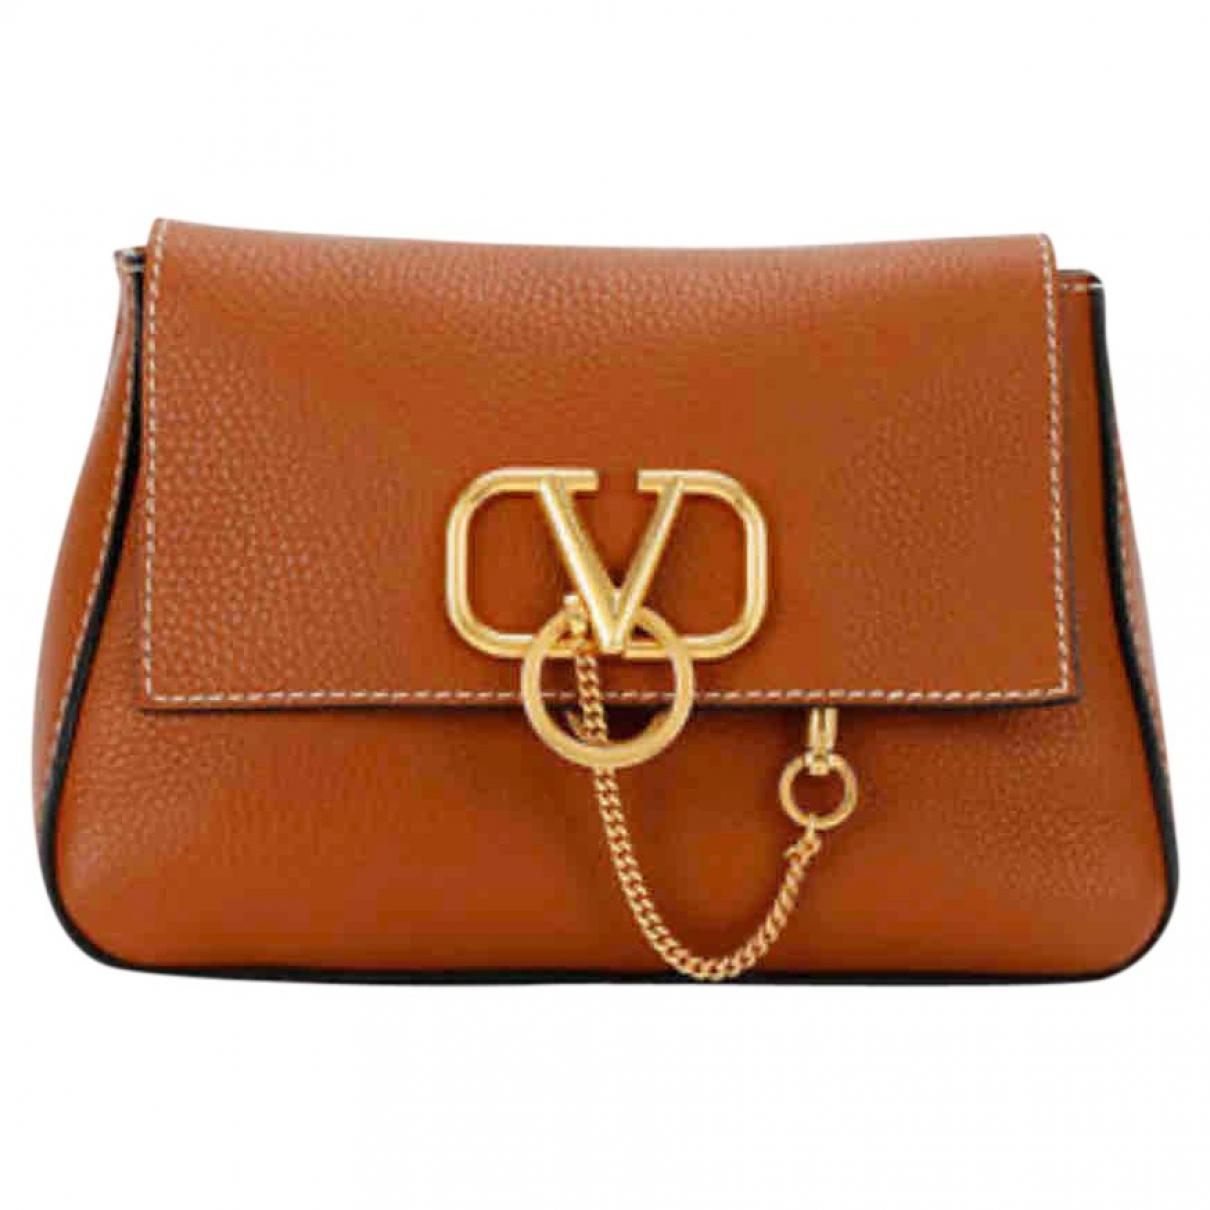 Valentino Garavani Vsling Brown Leather handbag for Women \N